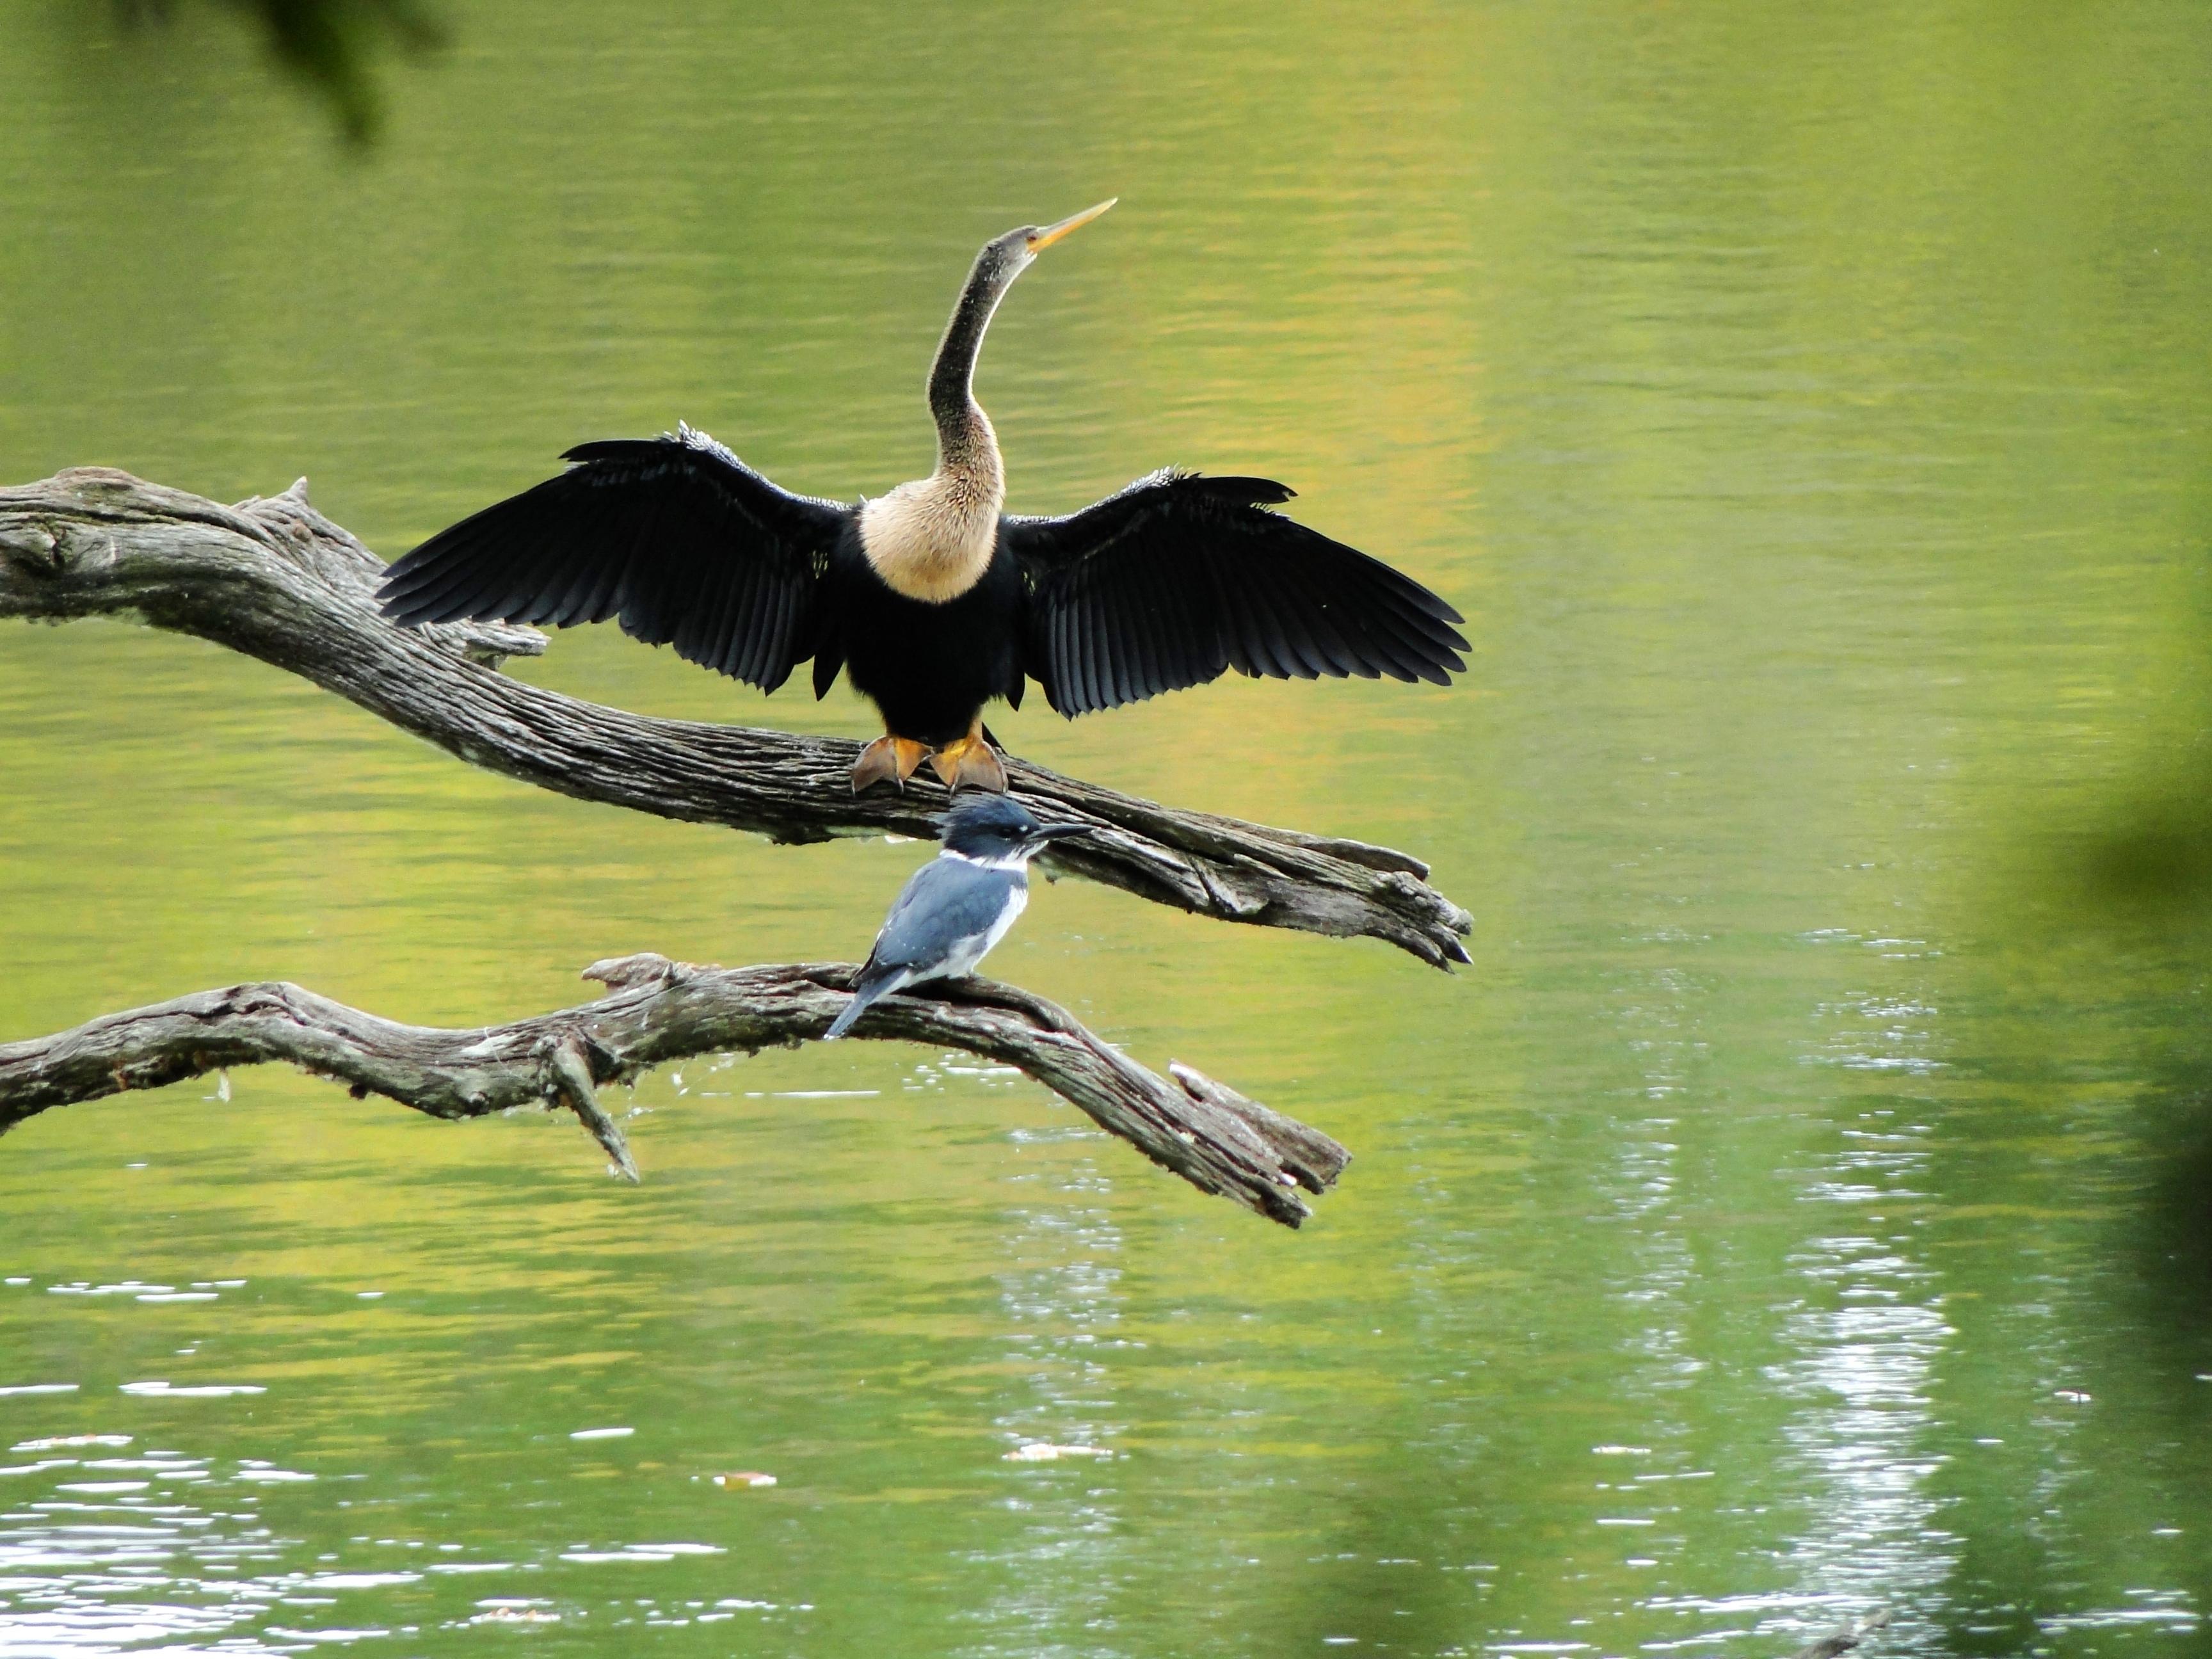 Cormorant and Kingfisher